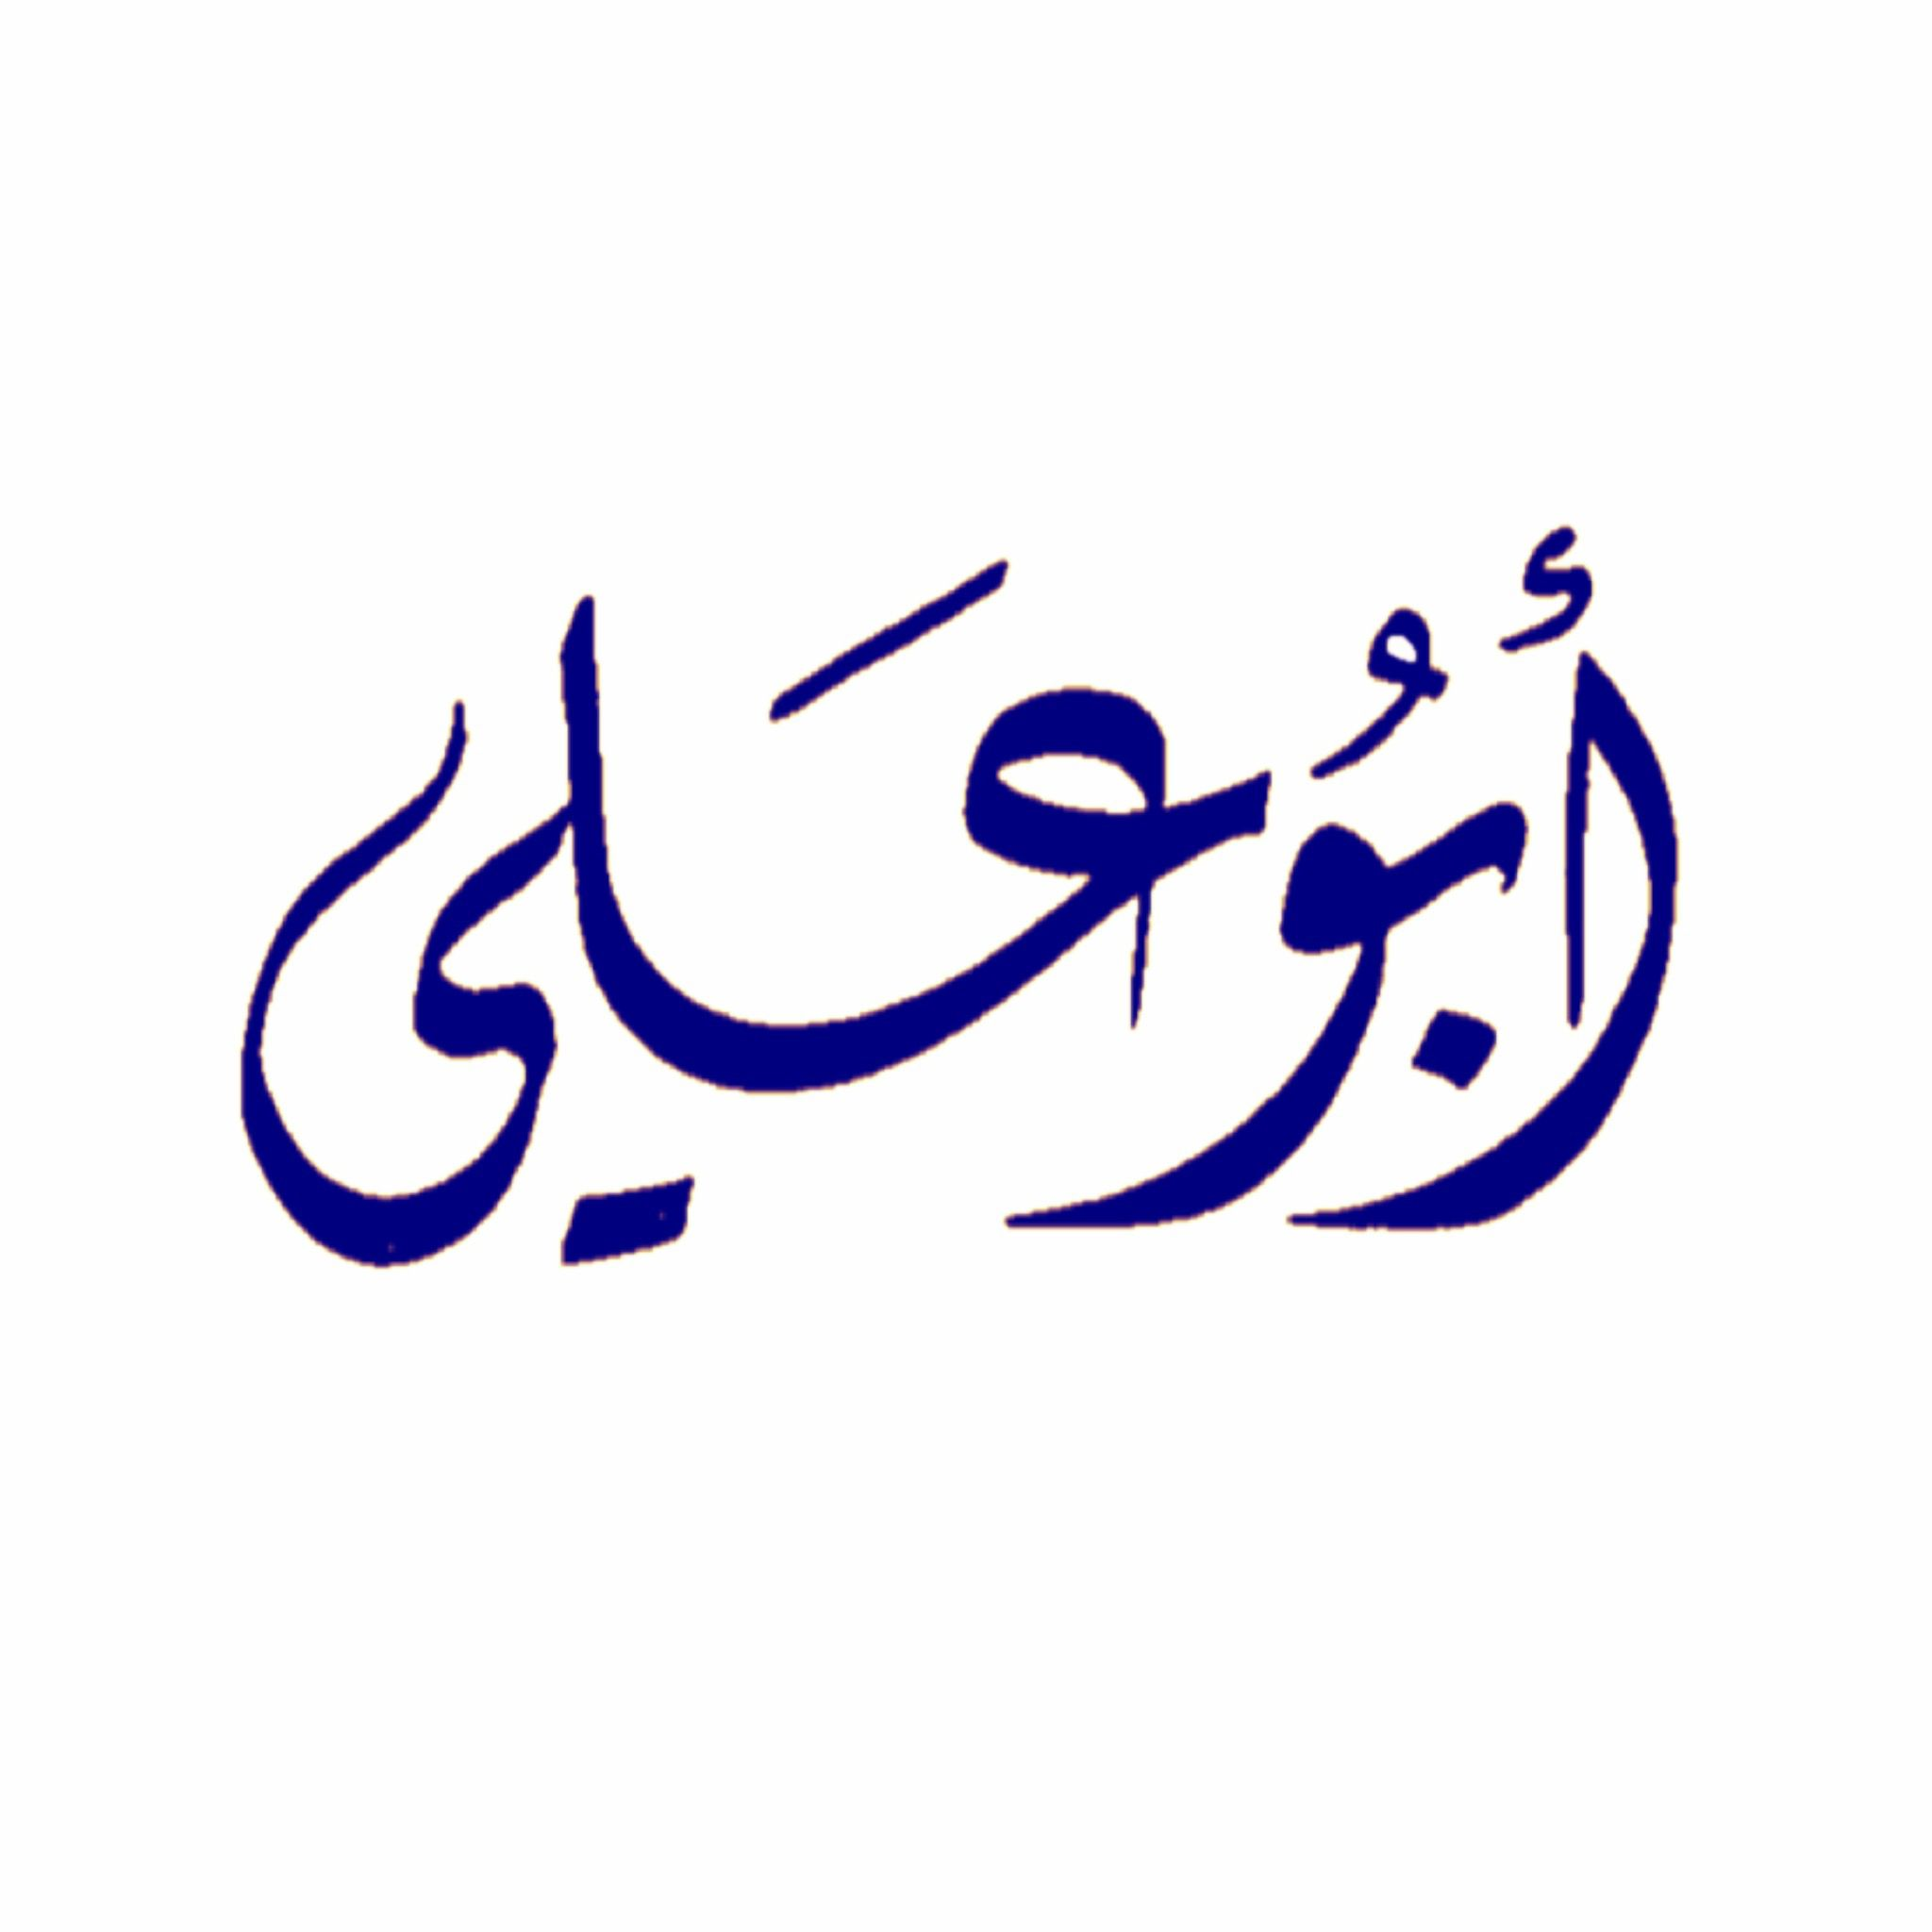 Pin By Dalia Faisal On Islamic Caligraphy Art Quote Prints Islamic Caligraphy Art Arabic Calligraphy Art